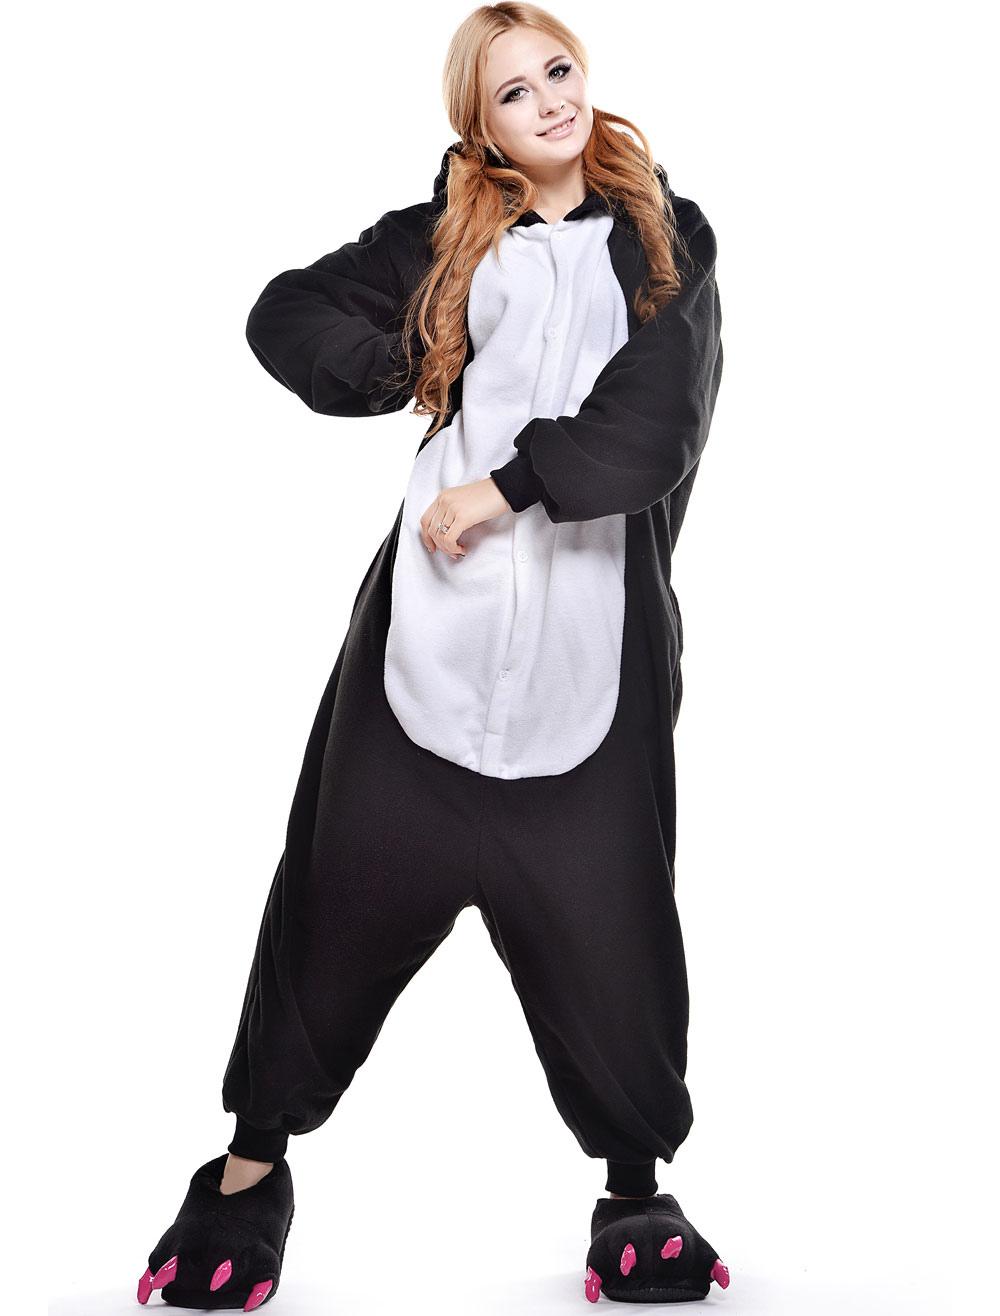 865ae8de854264 Kigurumi Pajama Penguin Onesie For Adult fleeceFlannel Animal Costume  Halloween